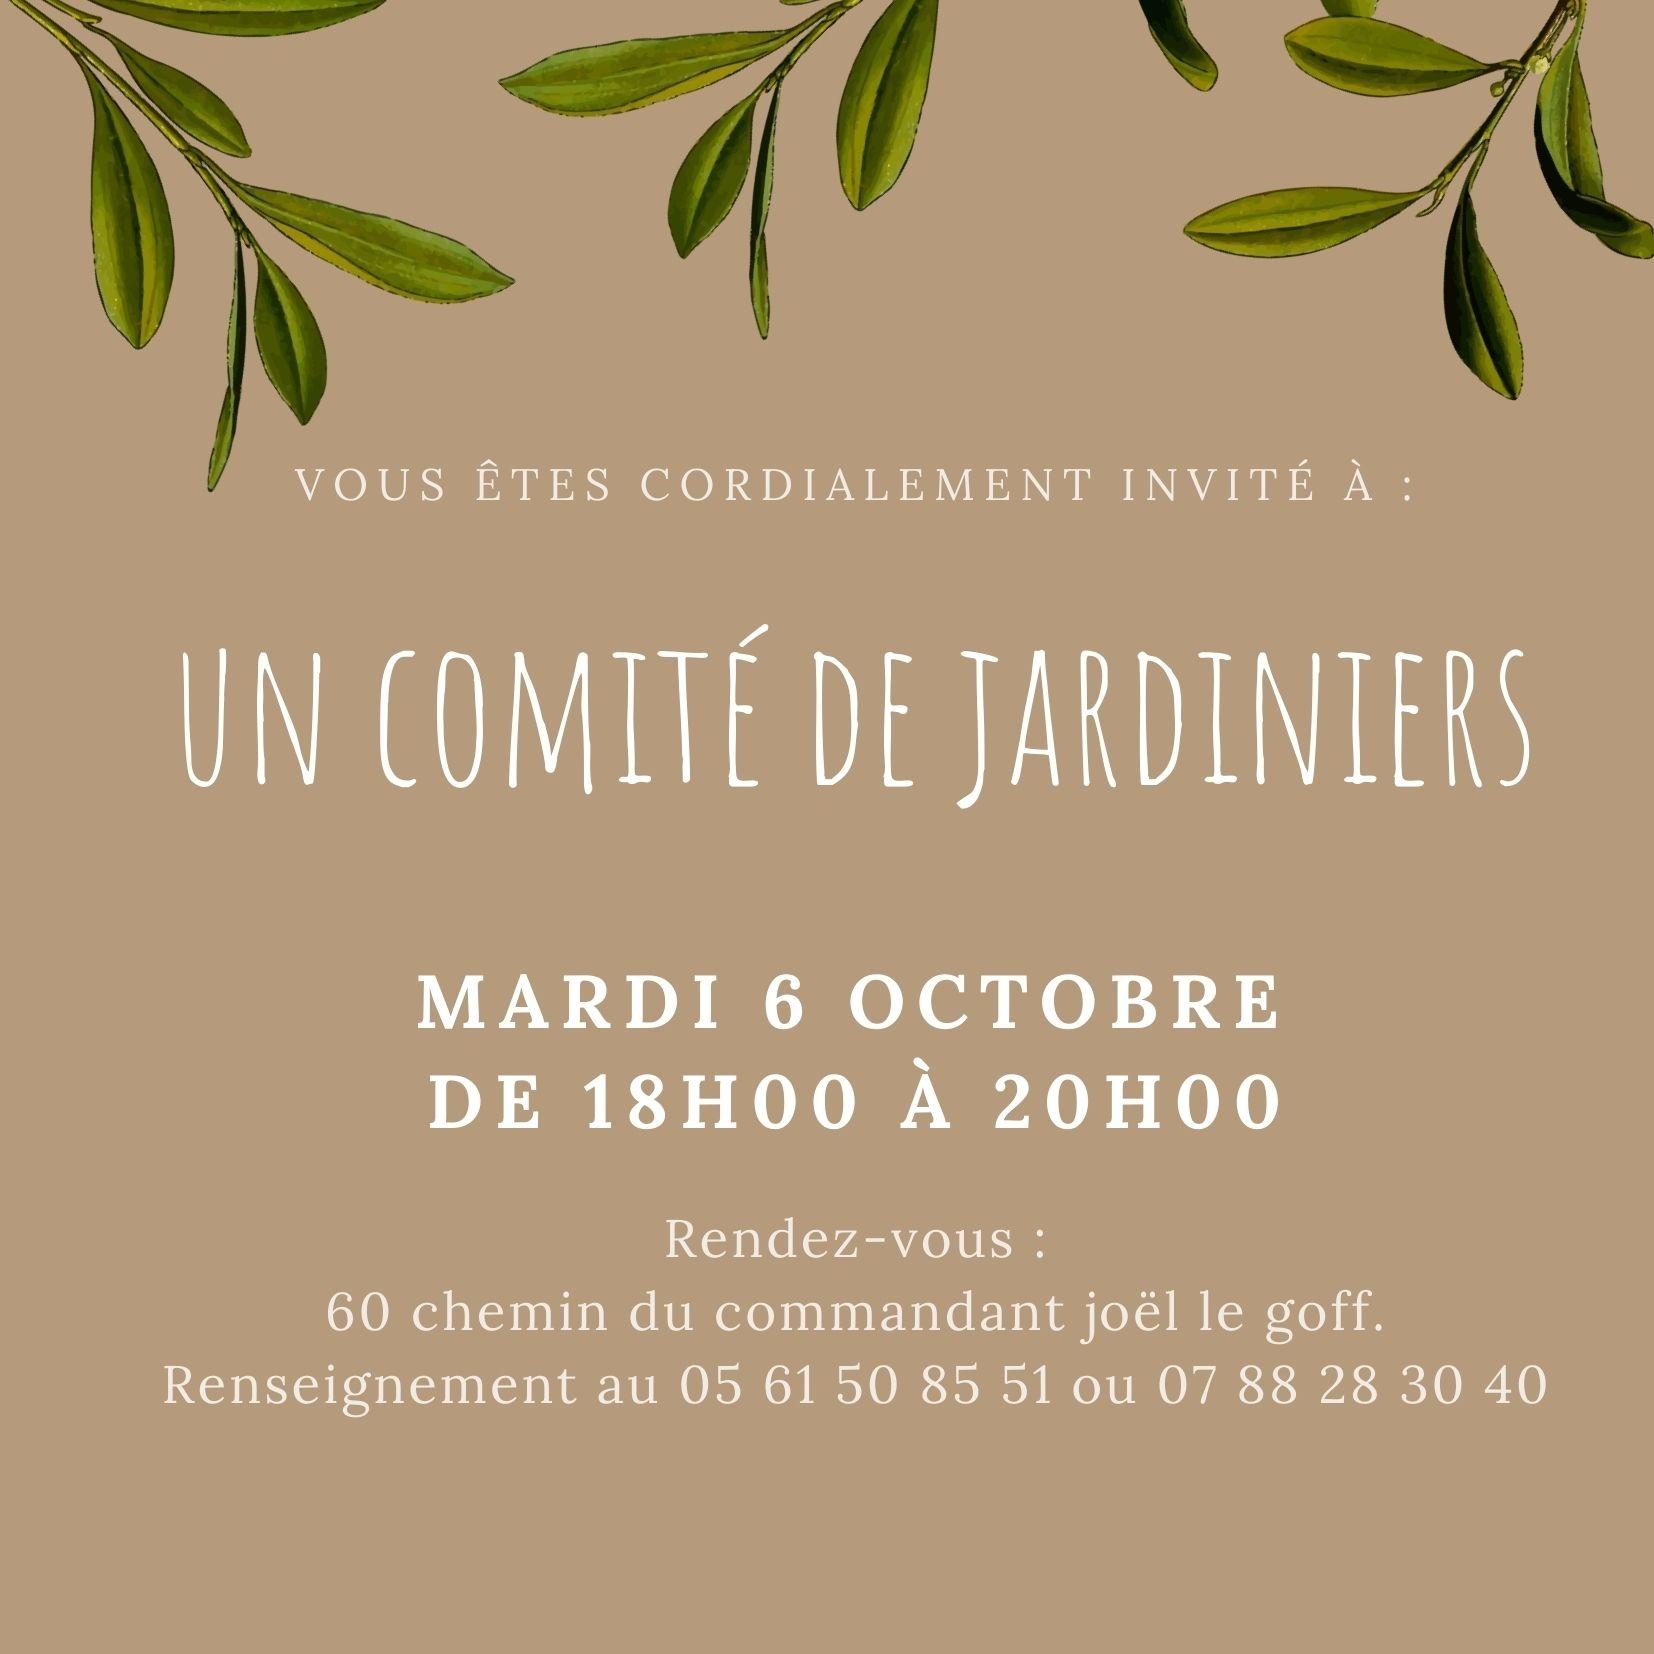 Invitation comité de jardiniers.jpg